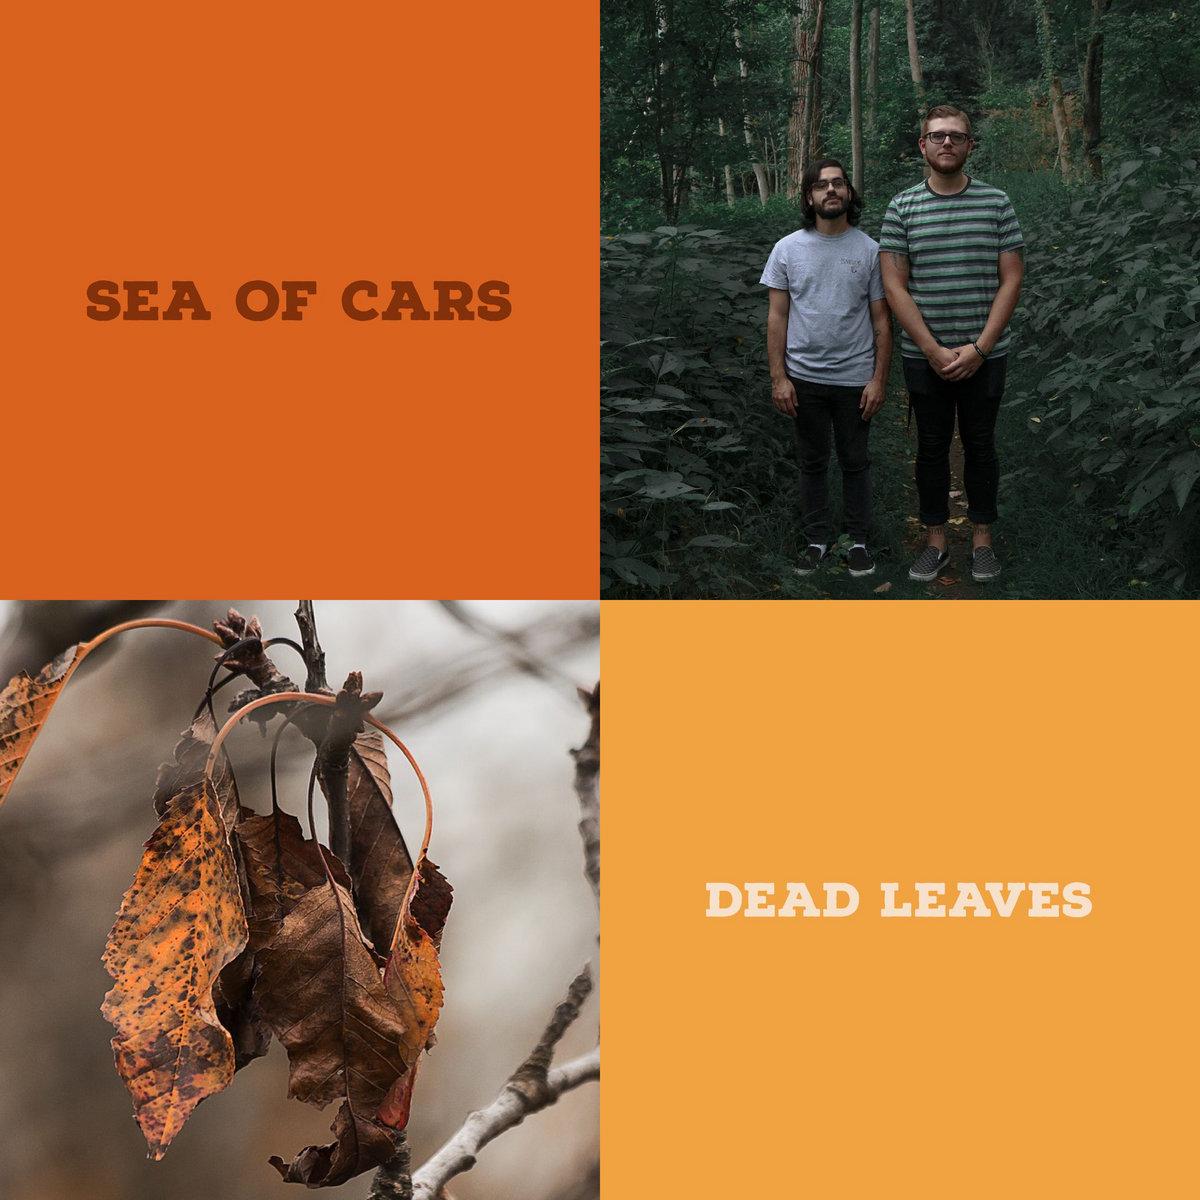 www.facebook.com/seaofcars82